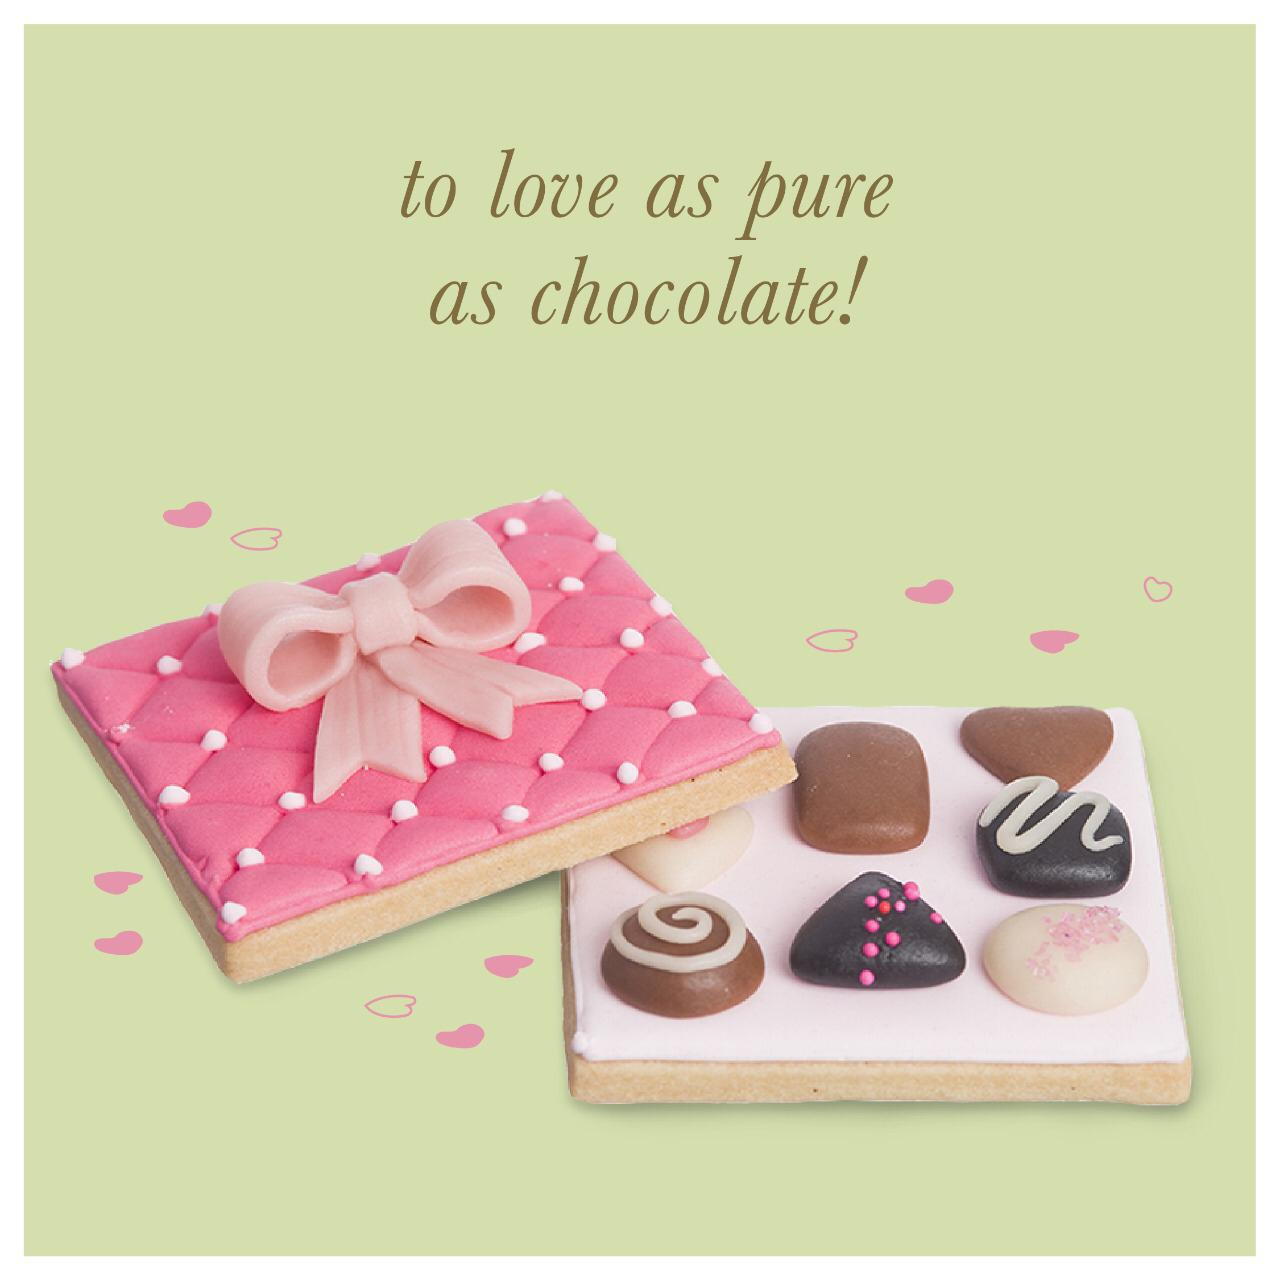 It's A Desserty Affair at Little Pleasures Patisserie